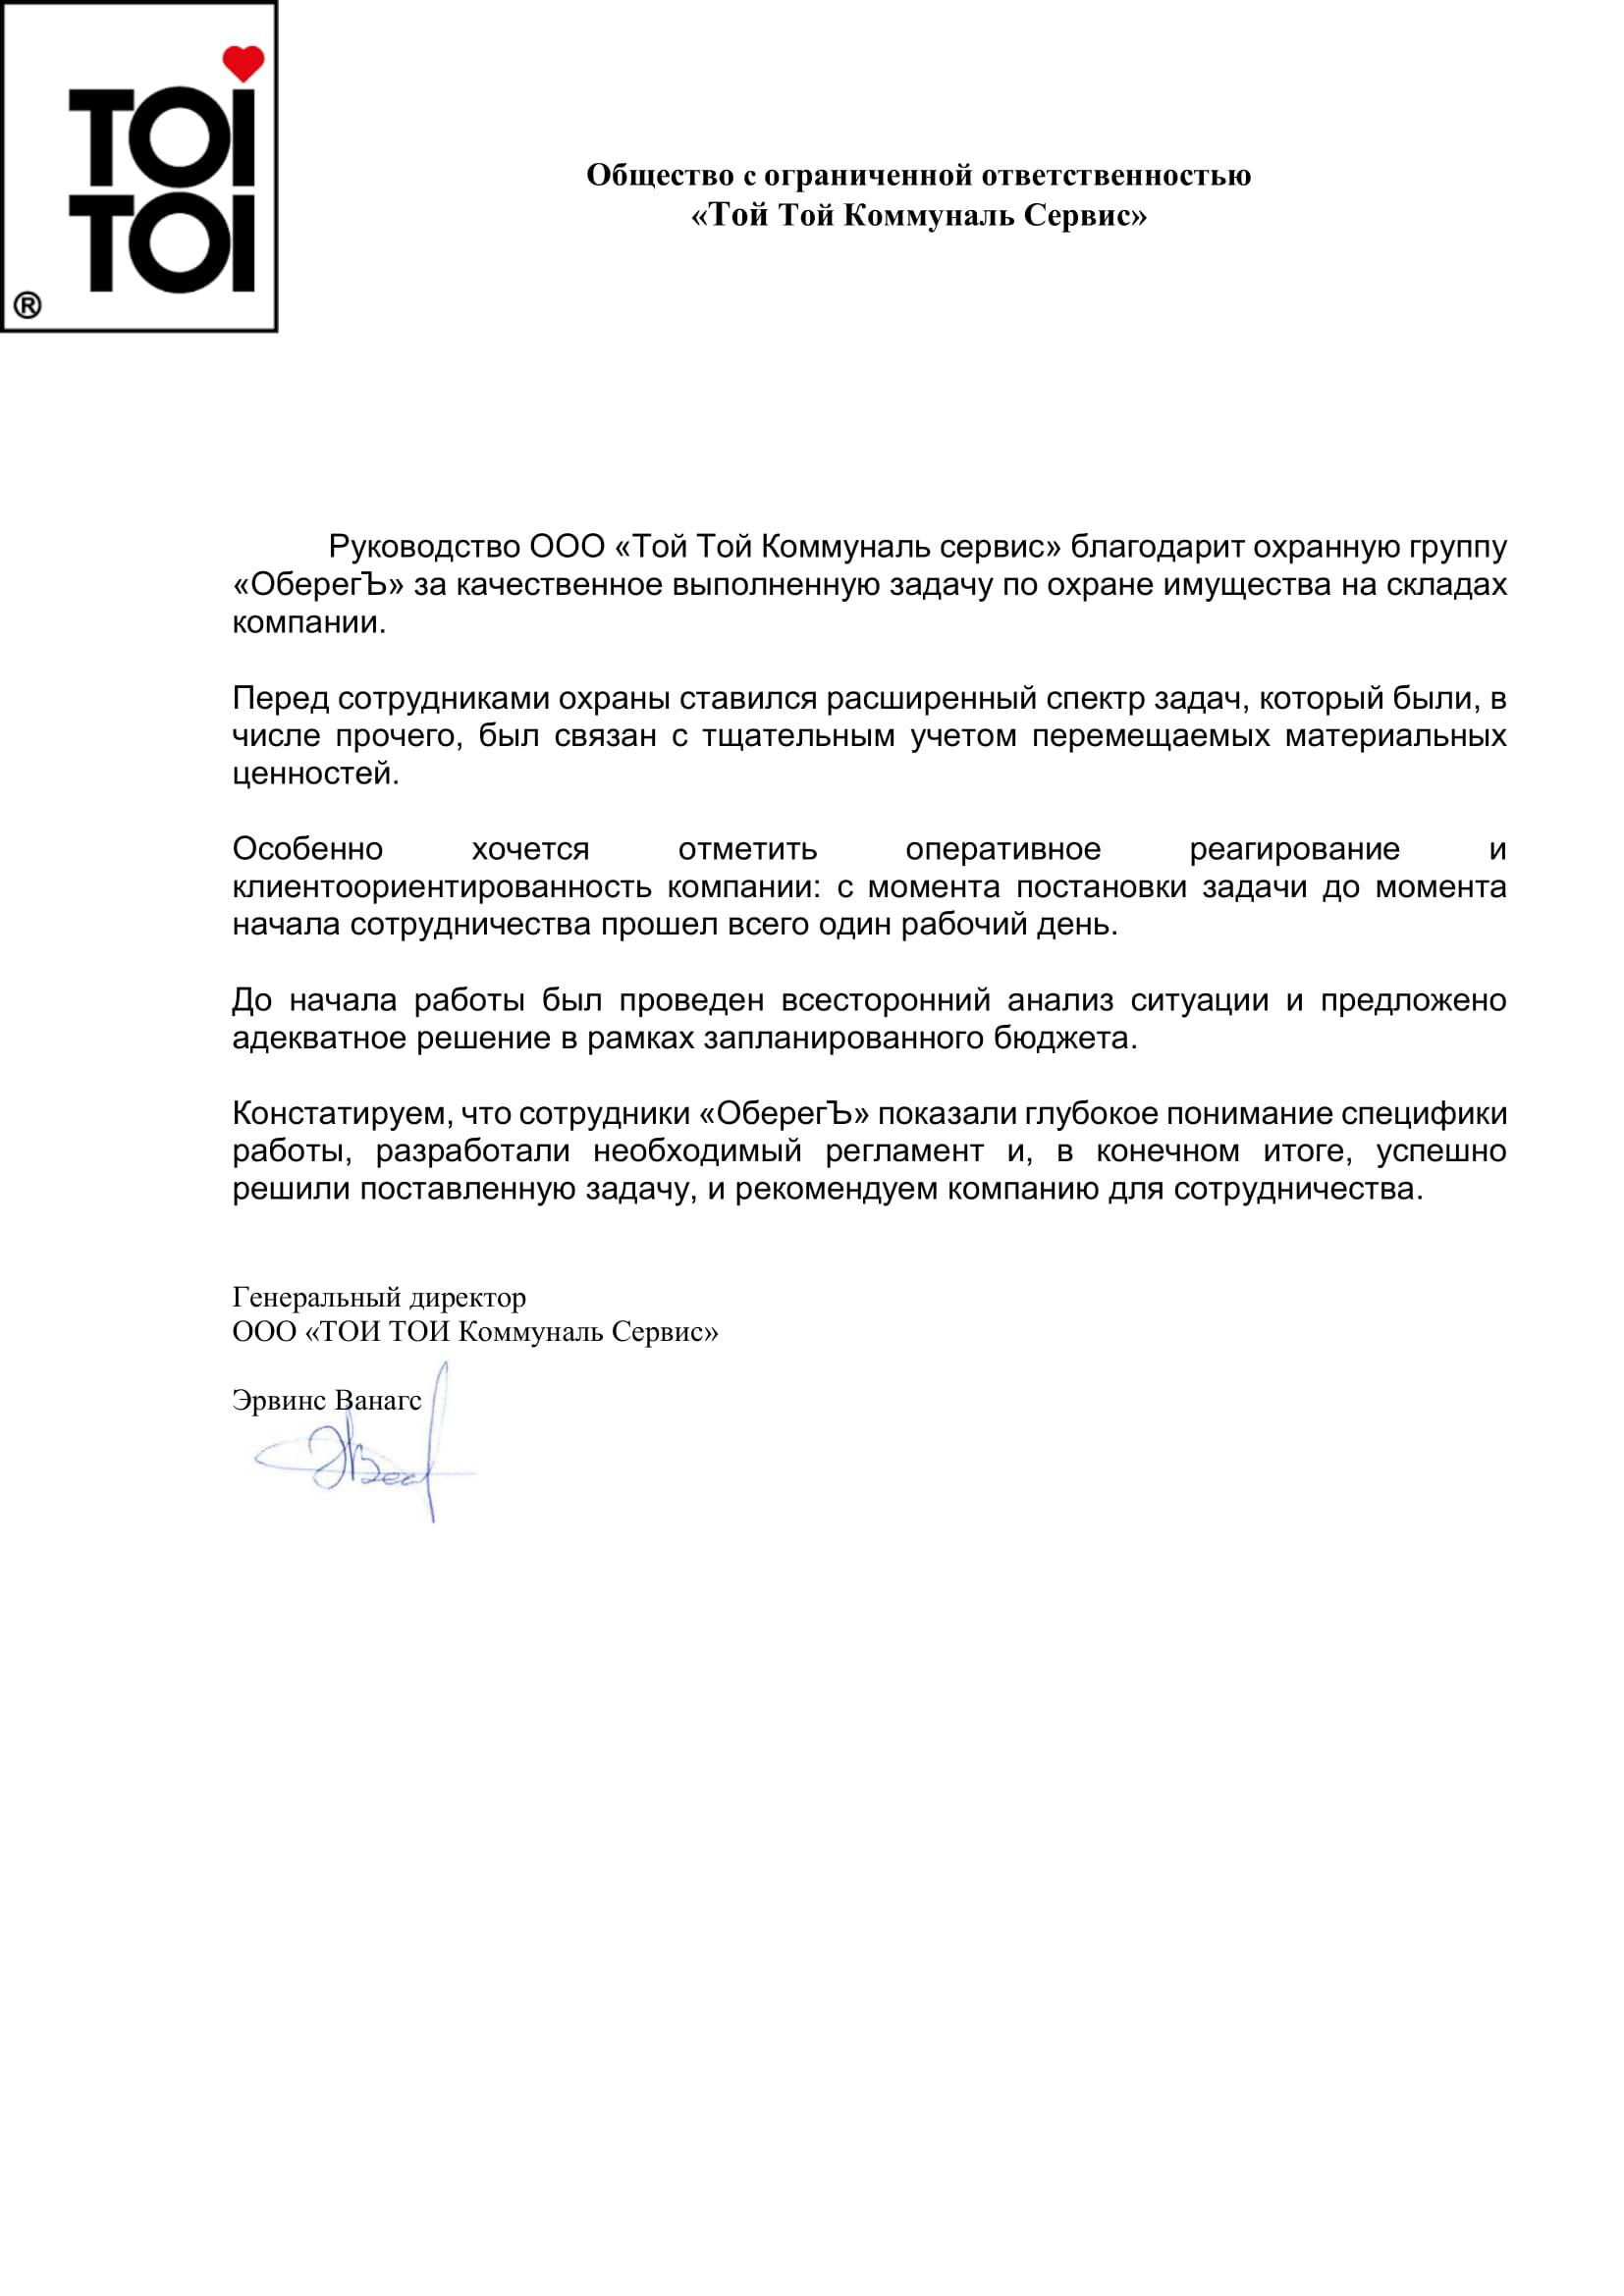 Рекомендация ToiToi КоммунальСервис